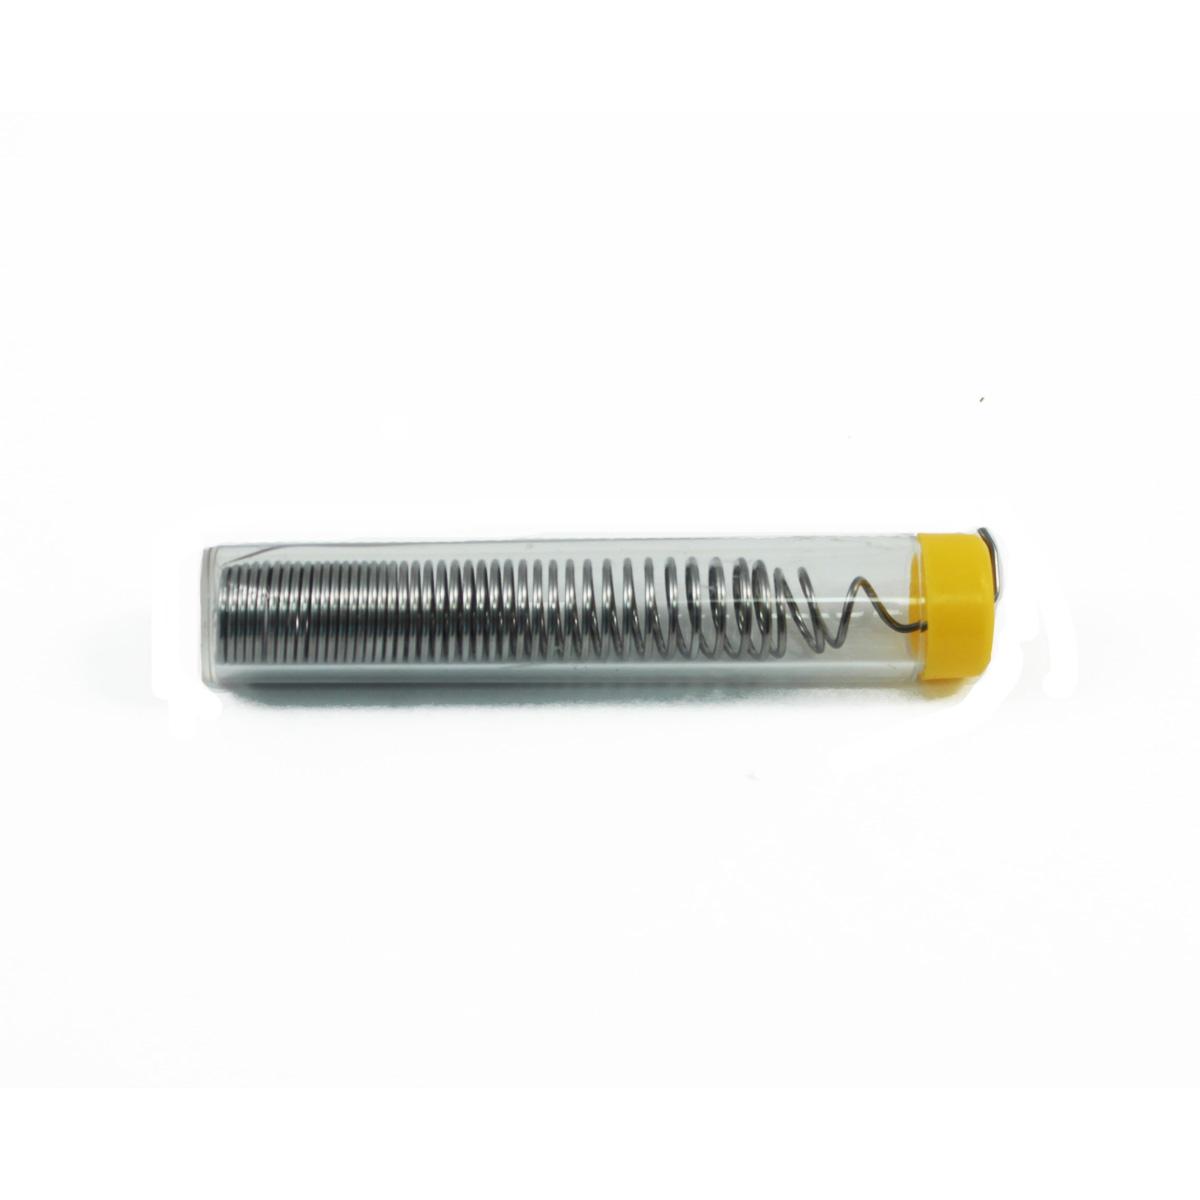 Universal-Tool-Solder-with-Flux-1mm-Diameter-2-Sizes miniatuur 4